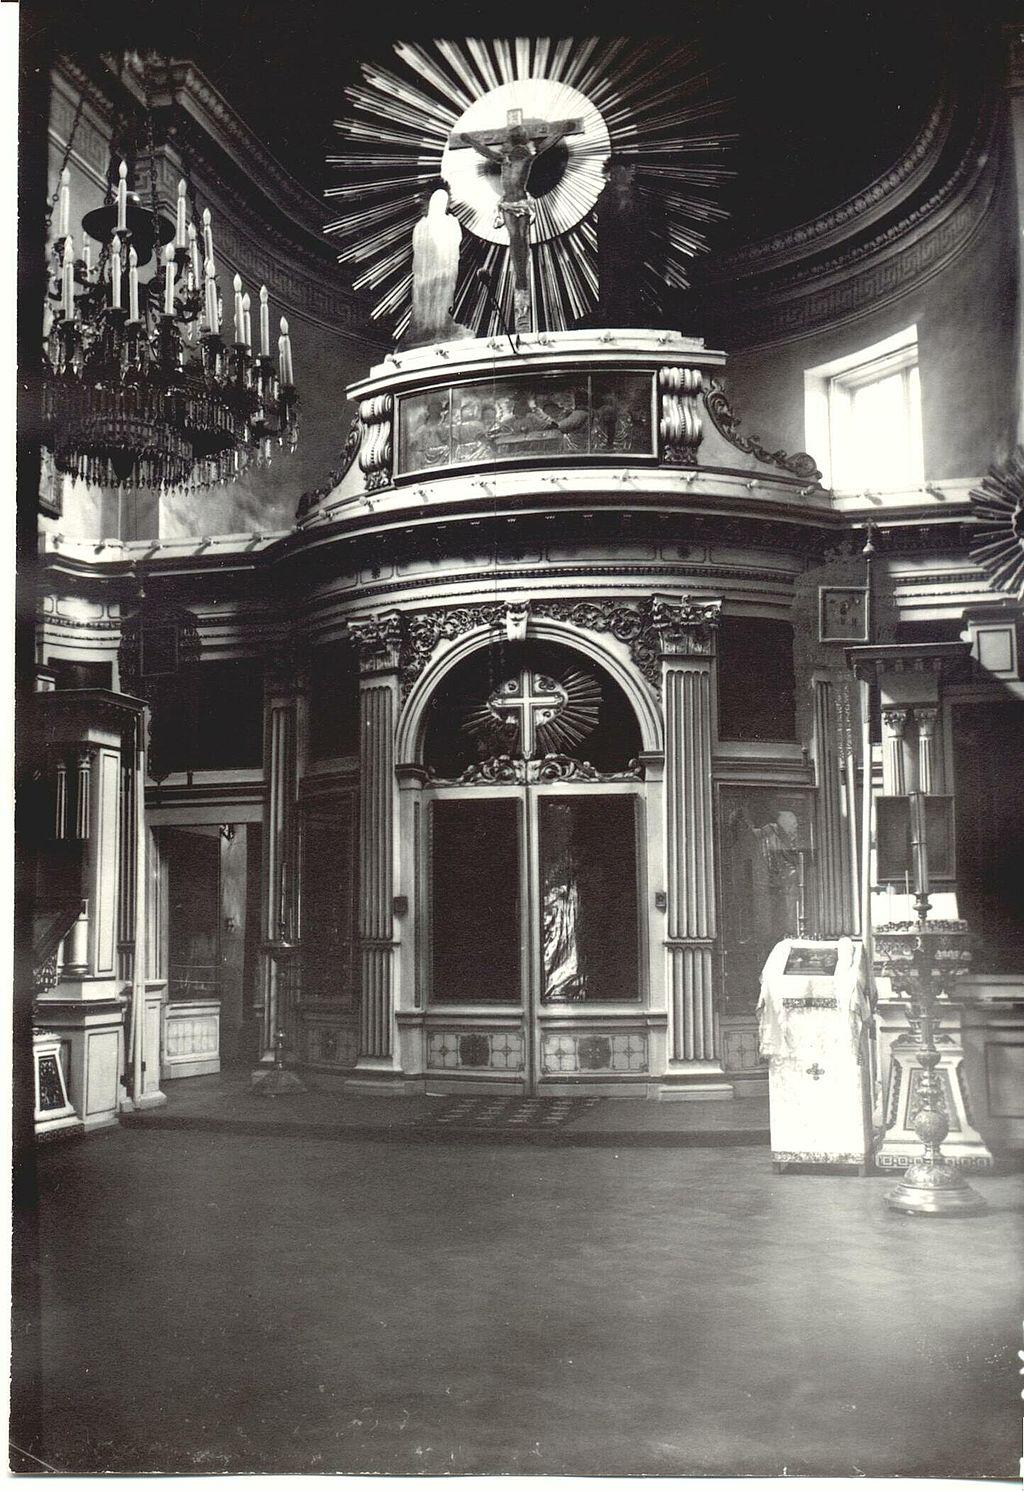 Церковь Святой Марии Магдалины. Фото 1910-х годов. Автор: Peterburg23, Wikimedia Commons